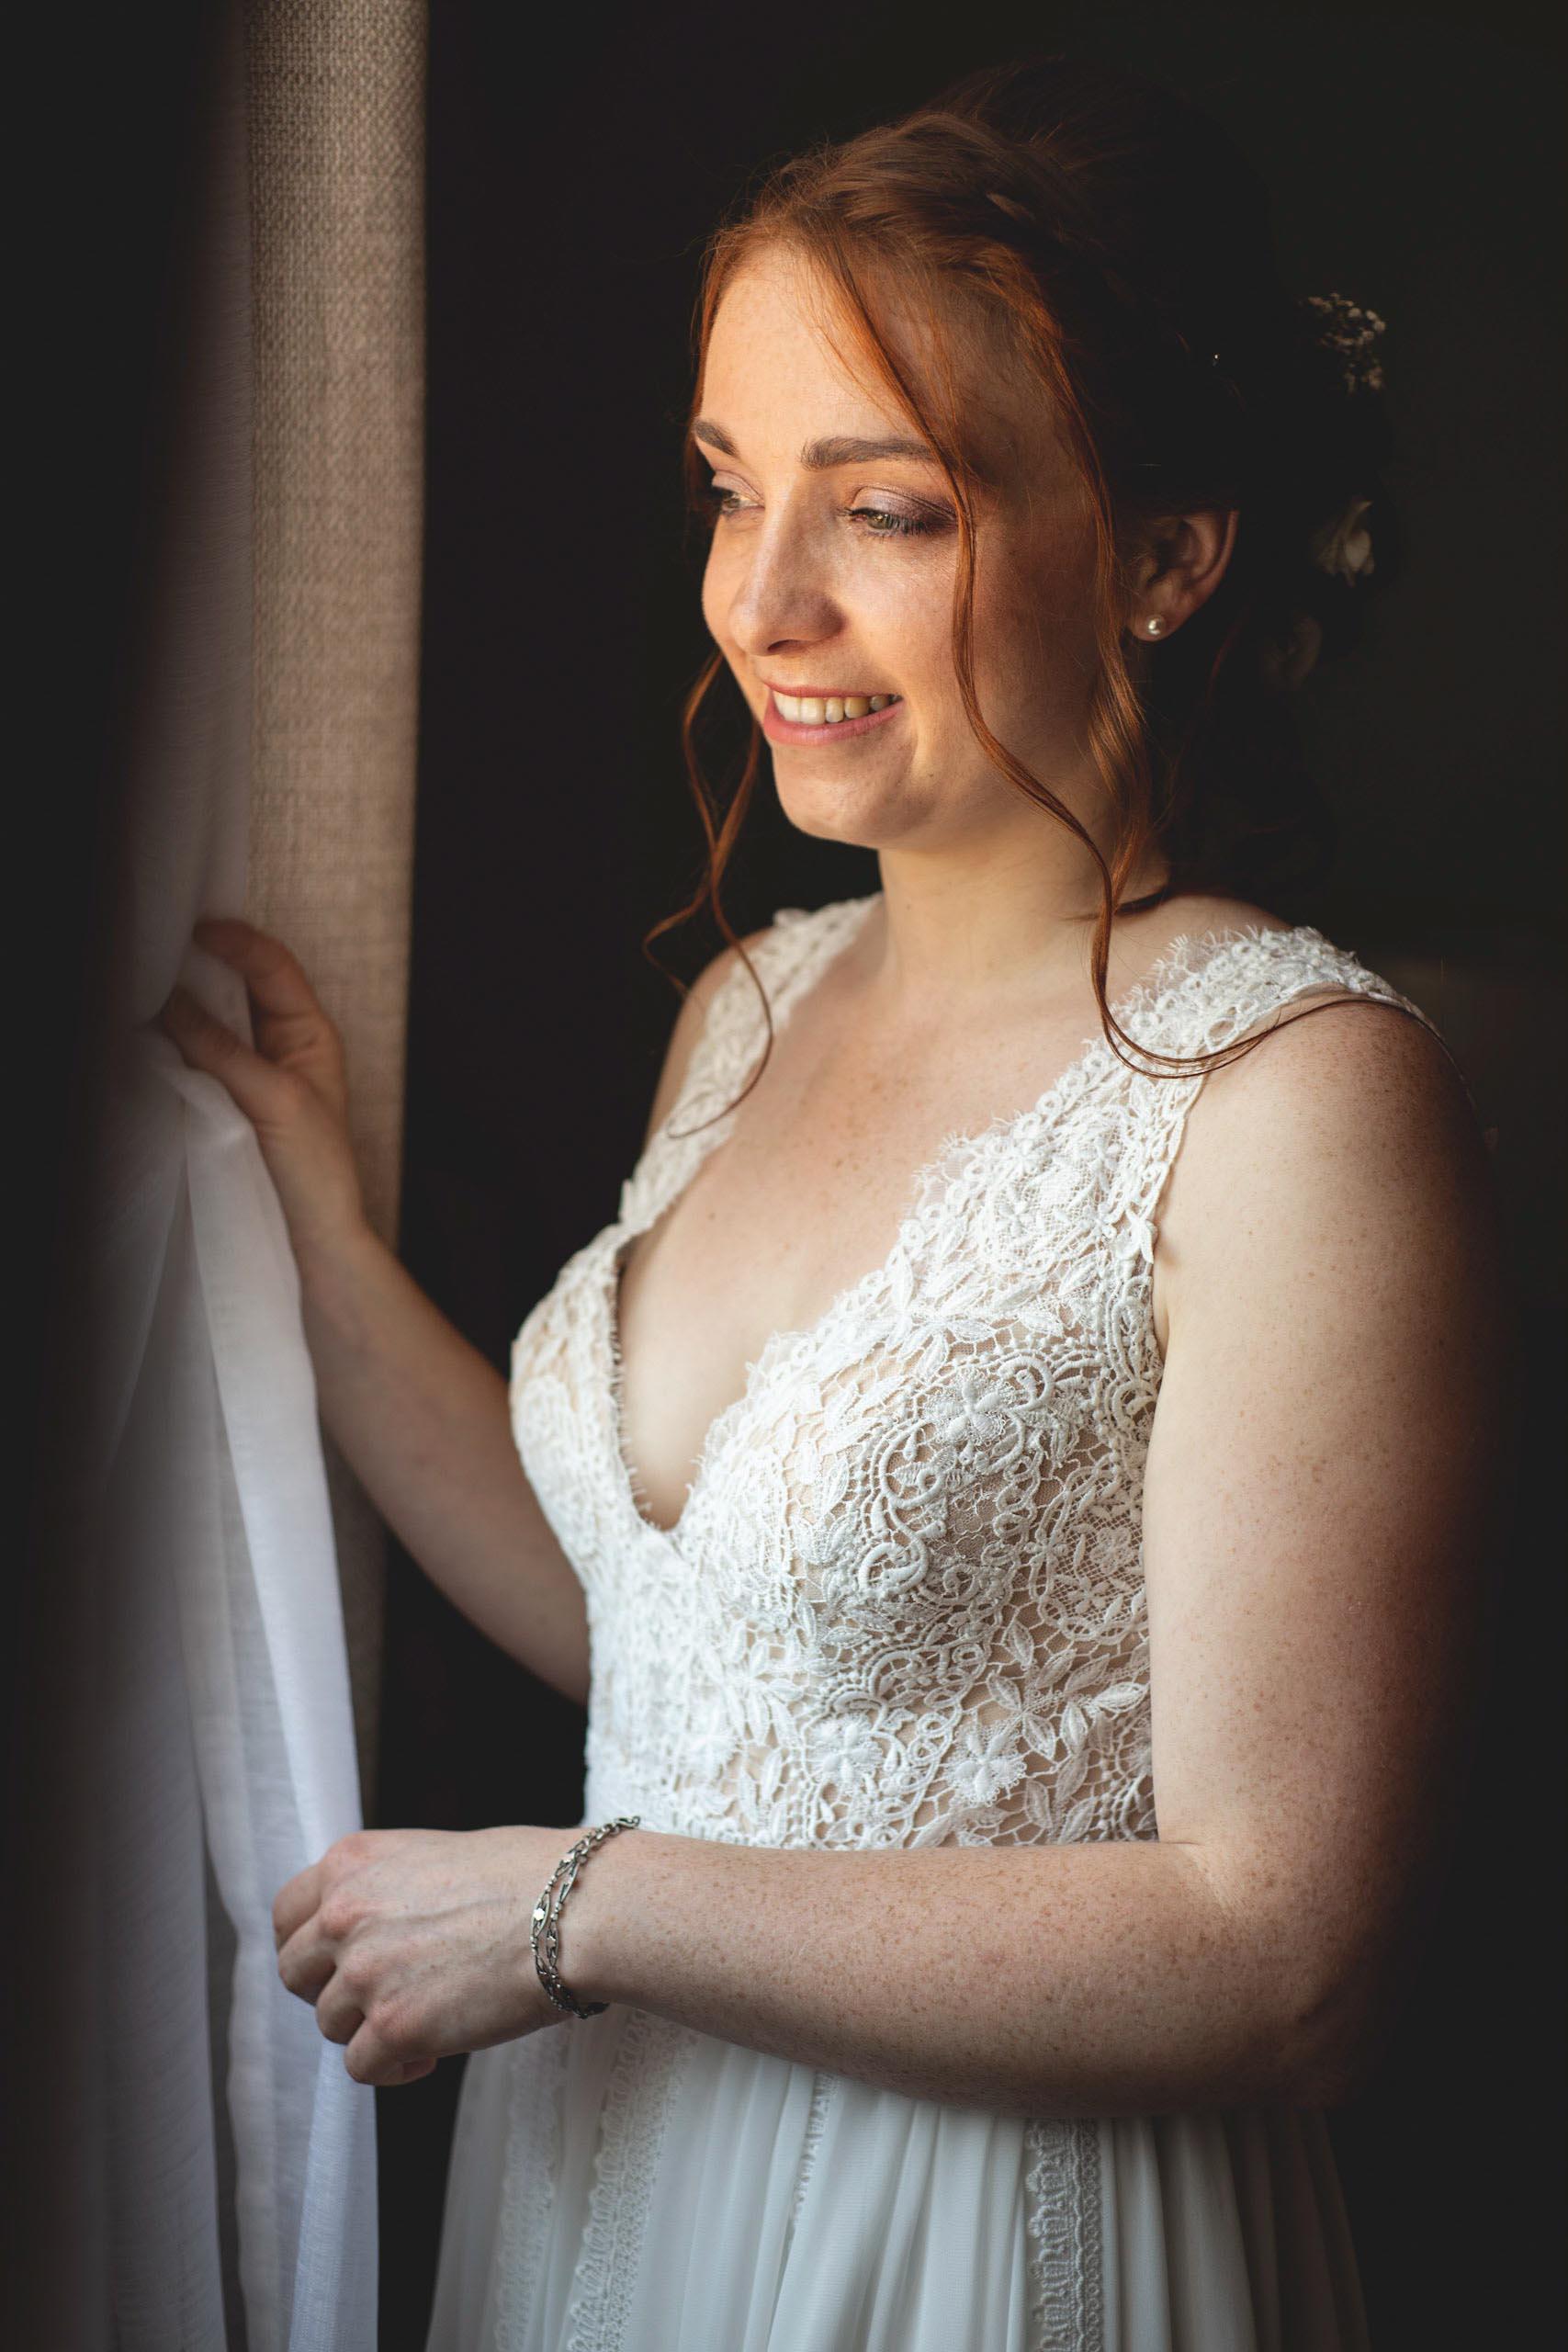 mariage-mylene-guillaume-ninon-photographe-22